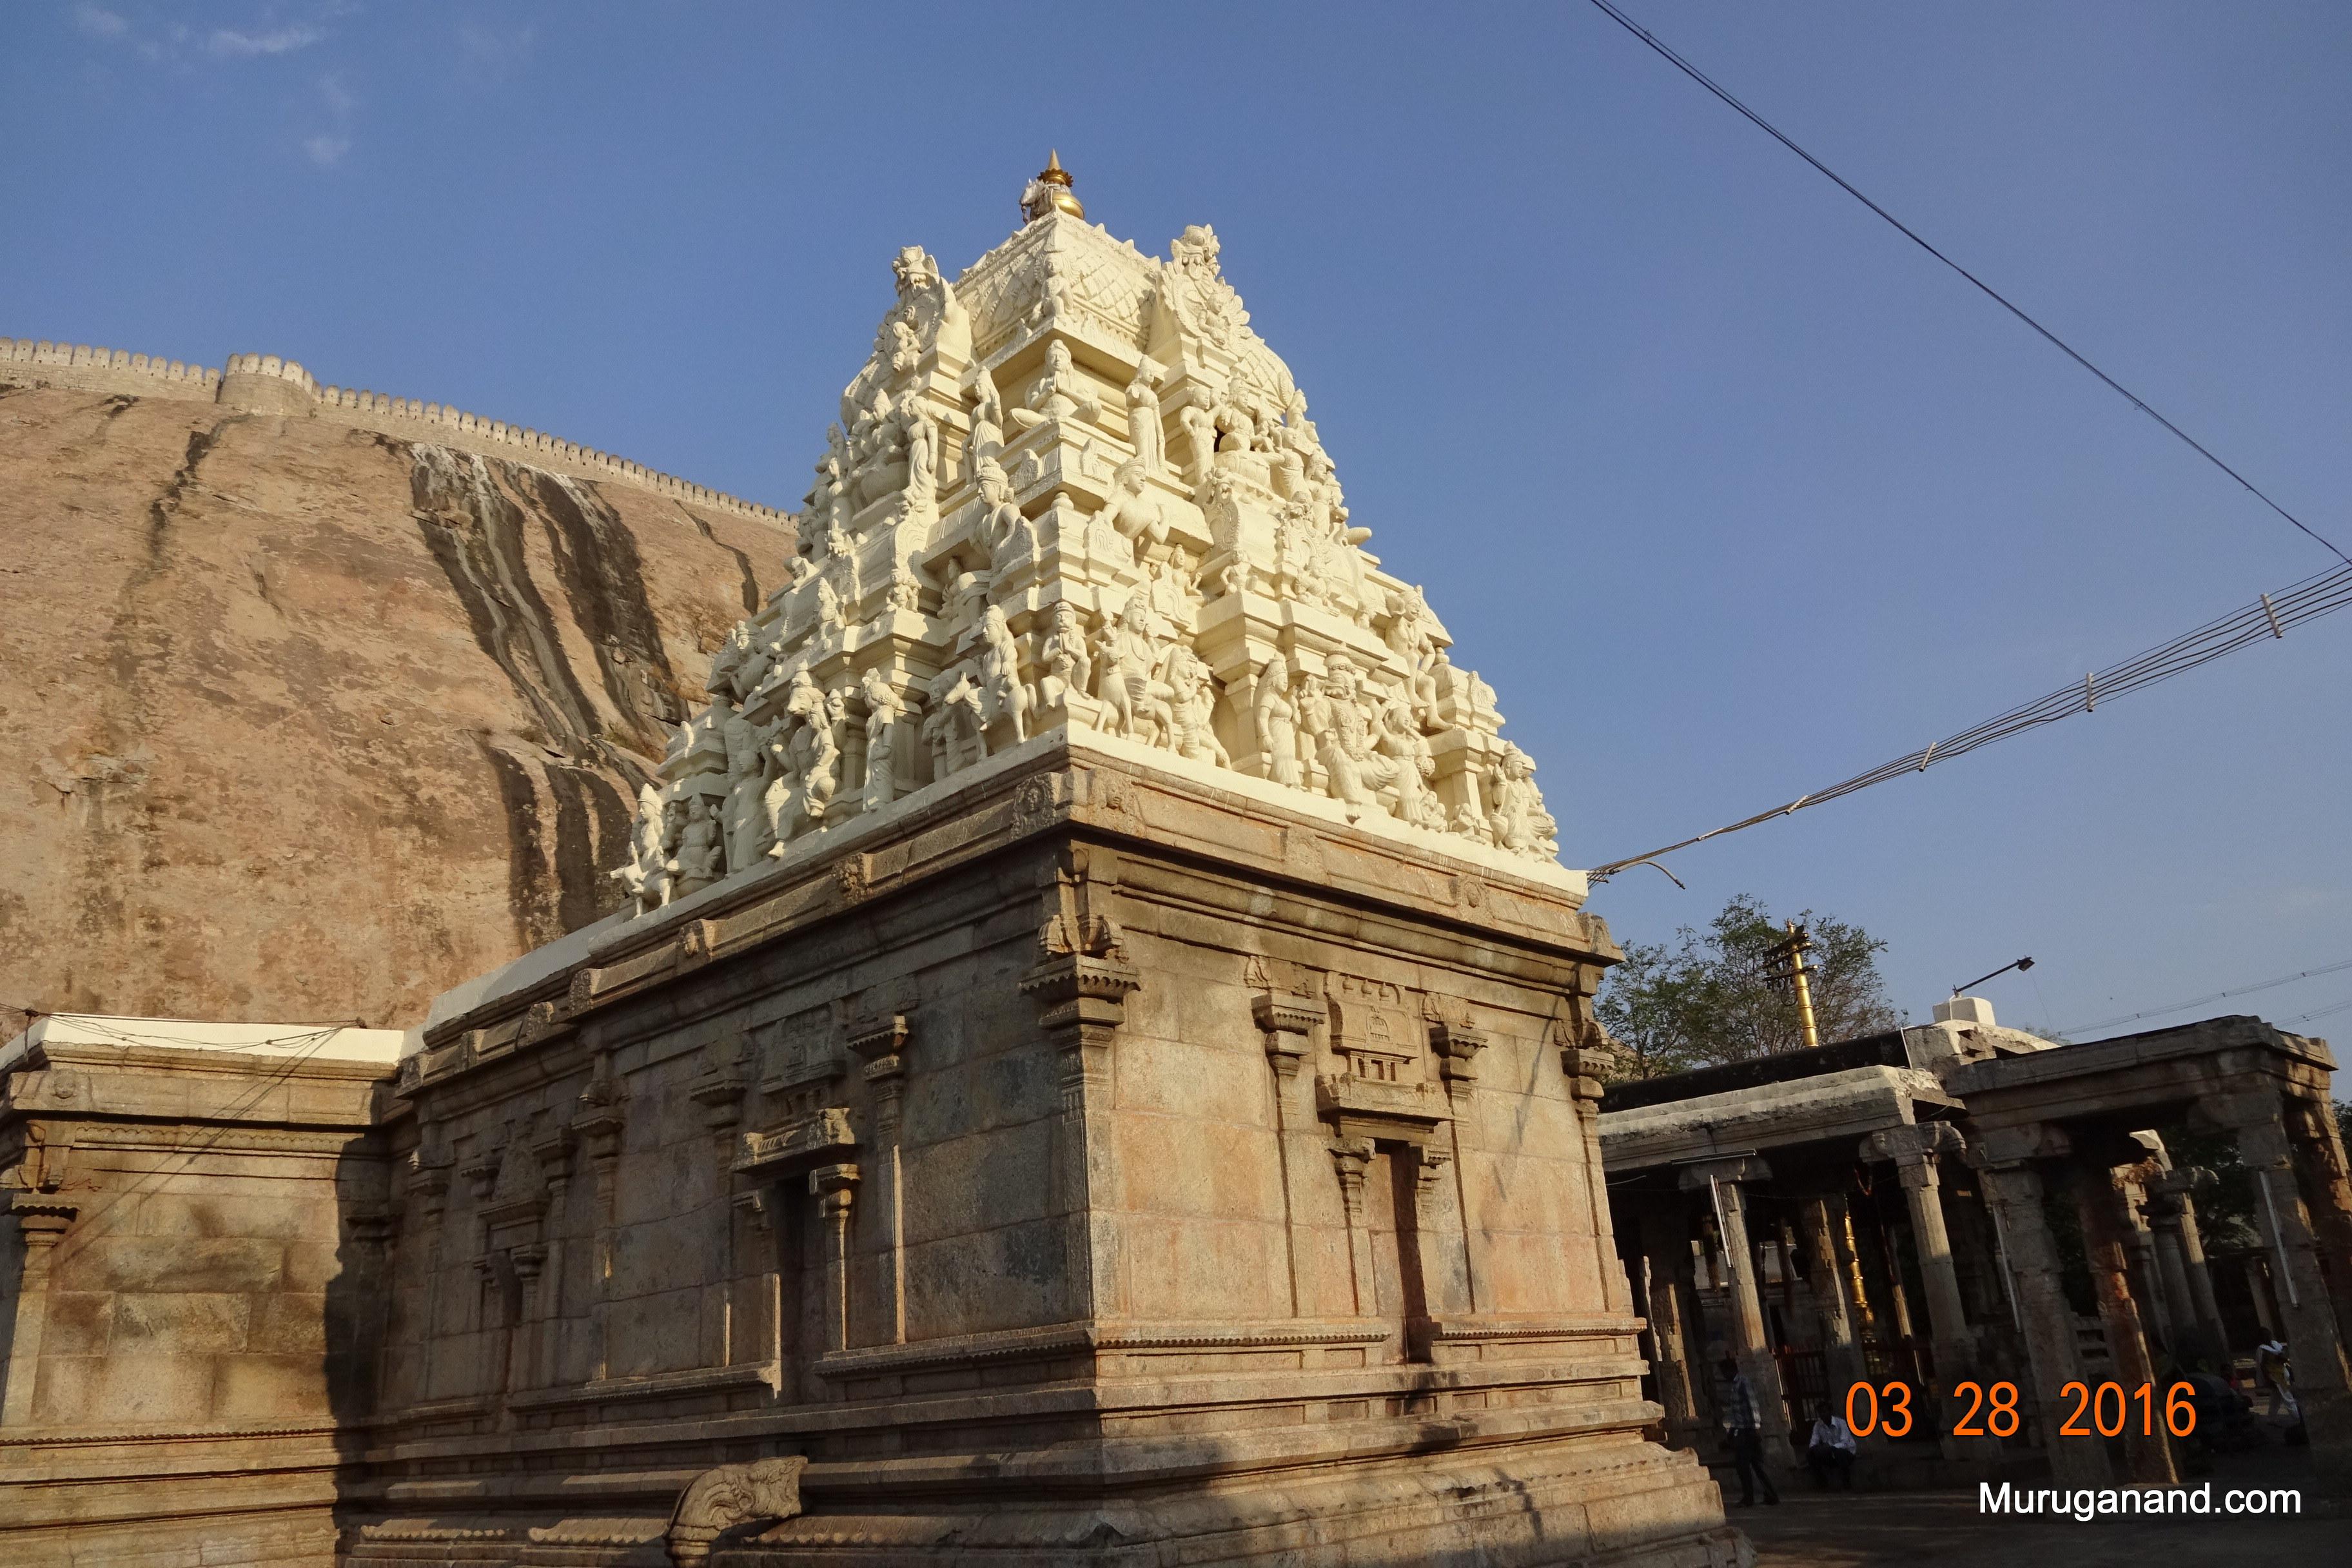 Namgiri Thayar is the family deity of Mathematician Srinivasa Ramanujan